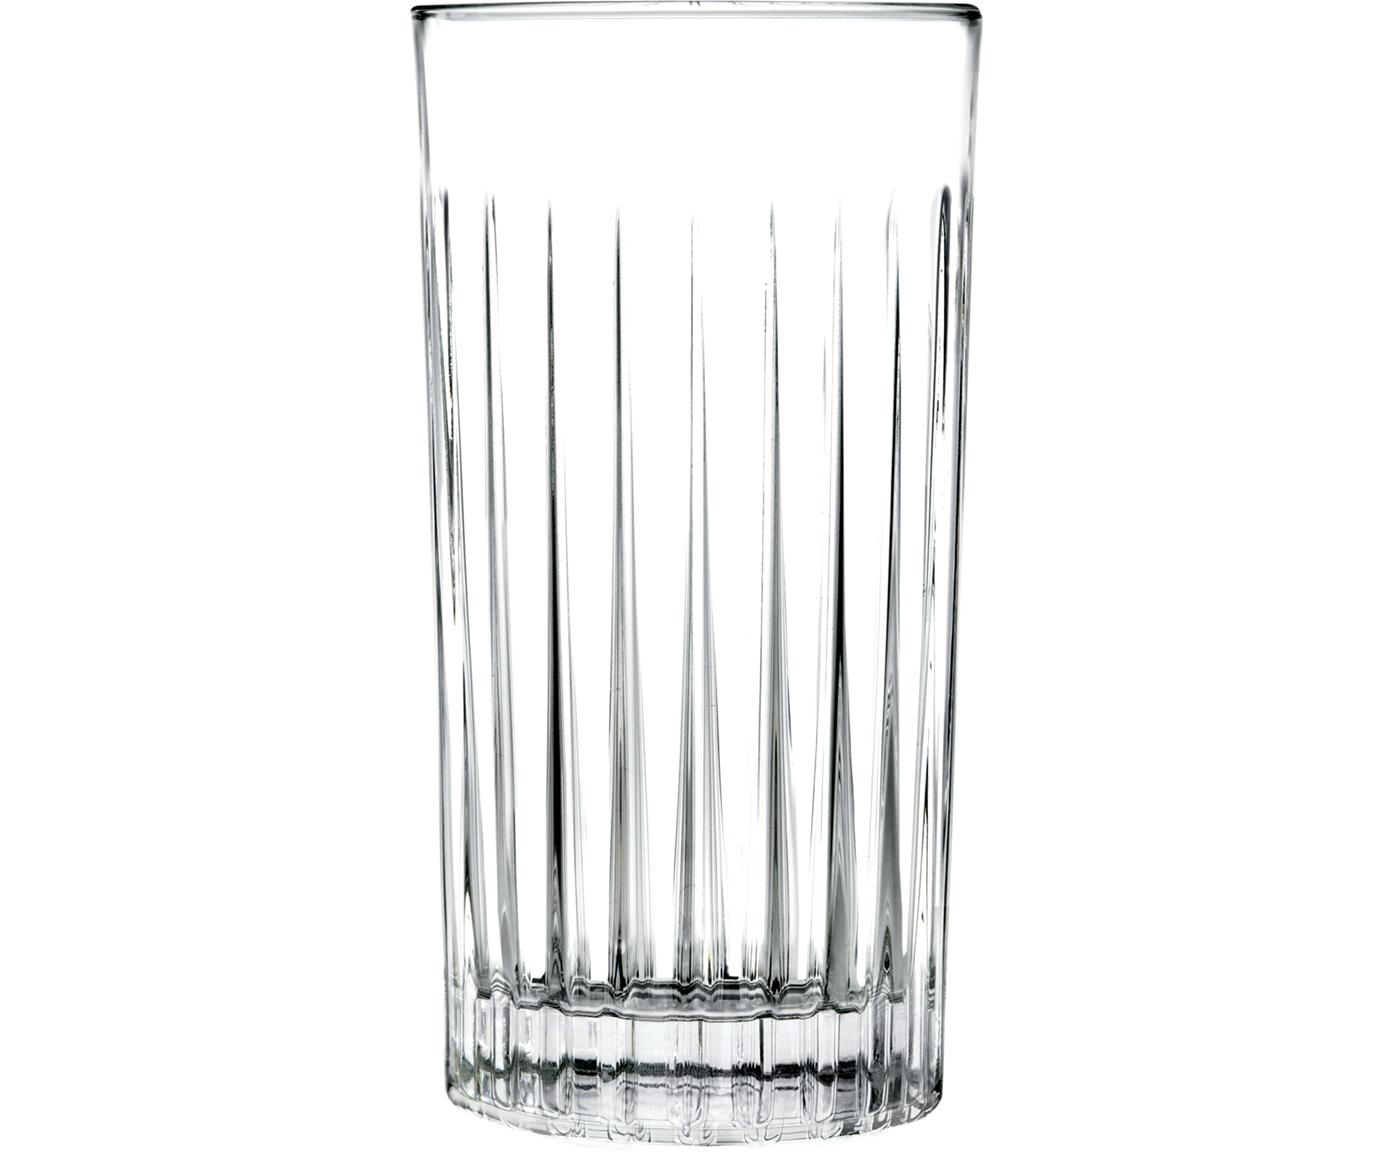 Vasos highball de cristal Timeless, 6uds., Cristal, Transparente, Ø 8 x Al 15 cm